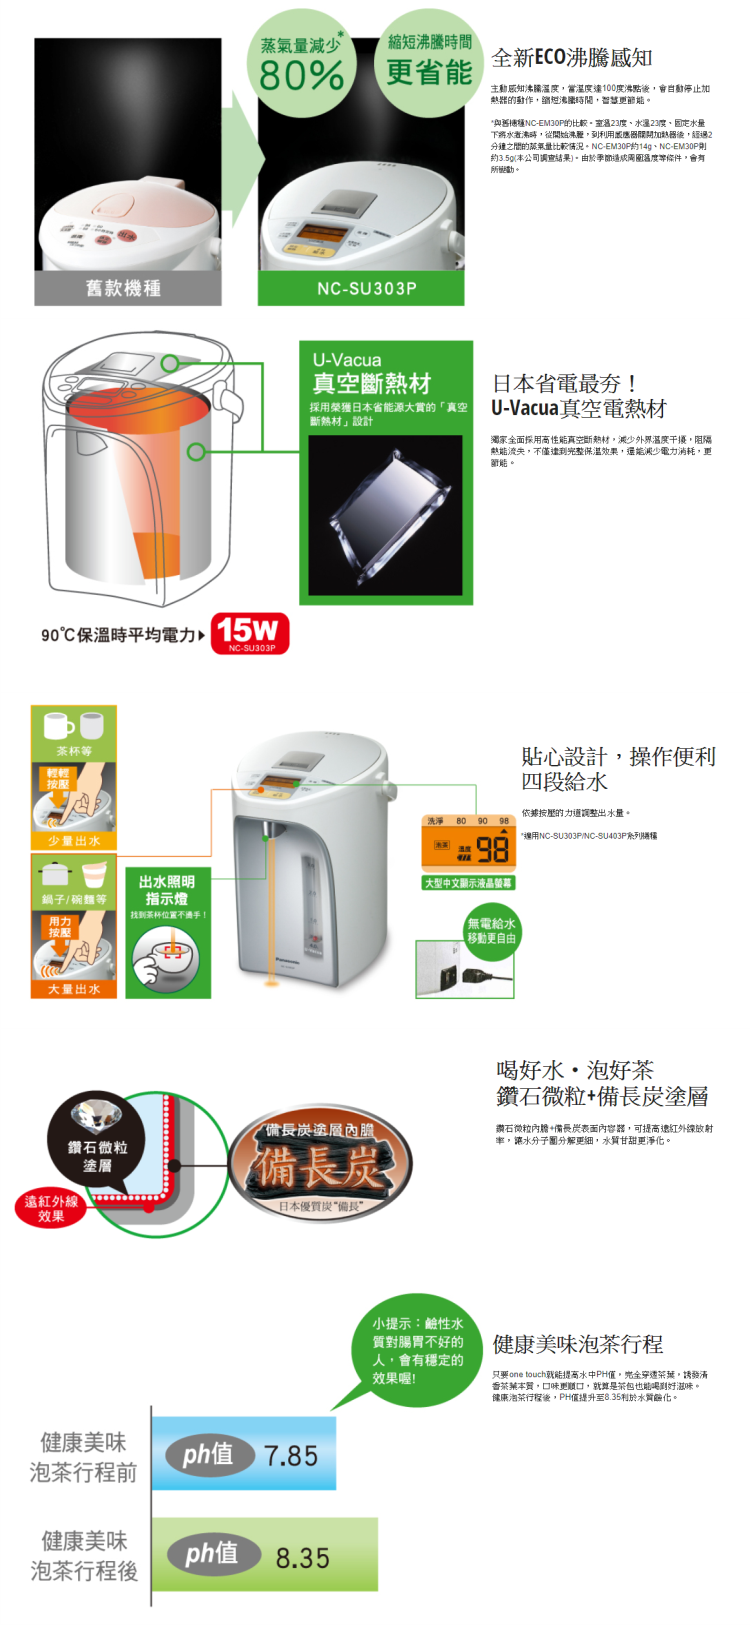 Panasonic 國際 NC-SU303P 3公升熱水瓶 完售